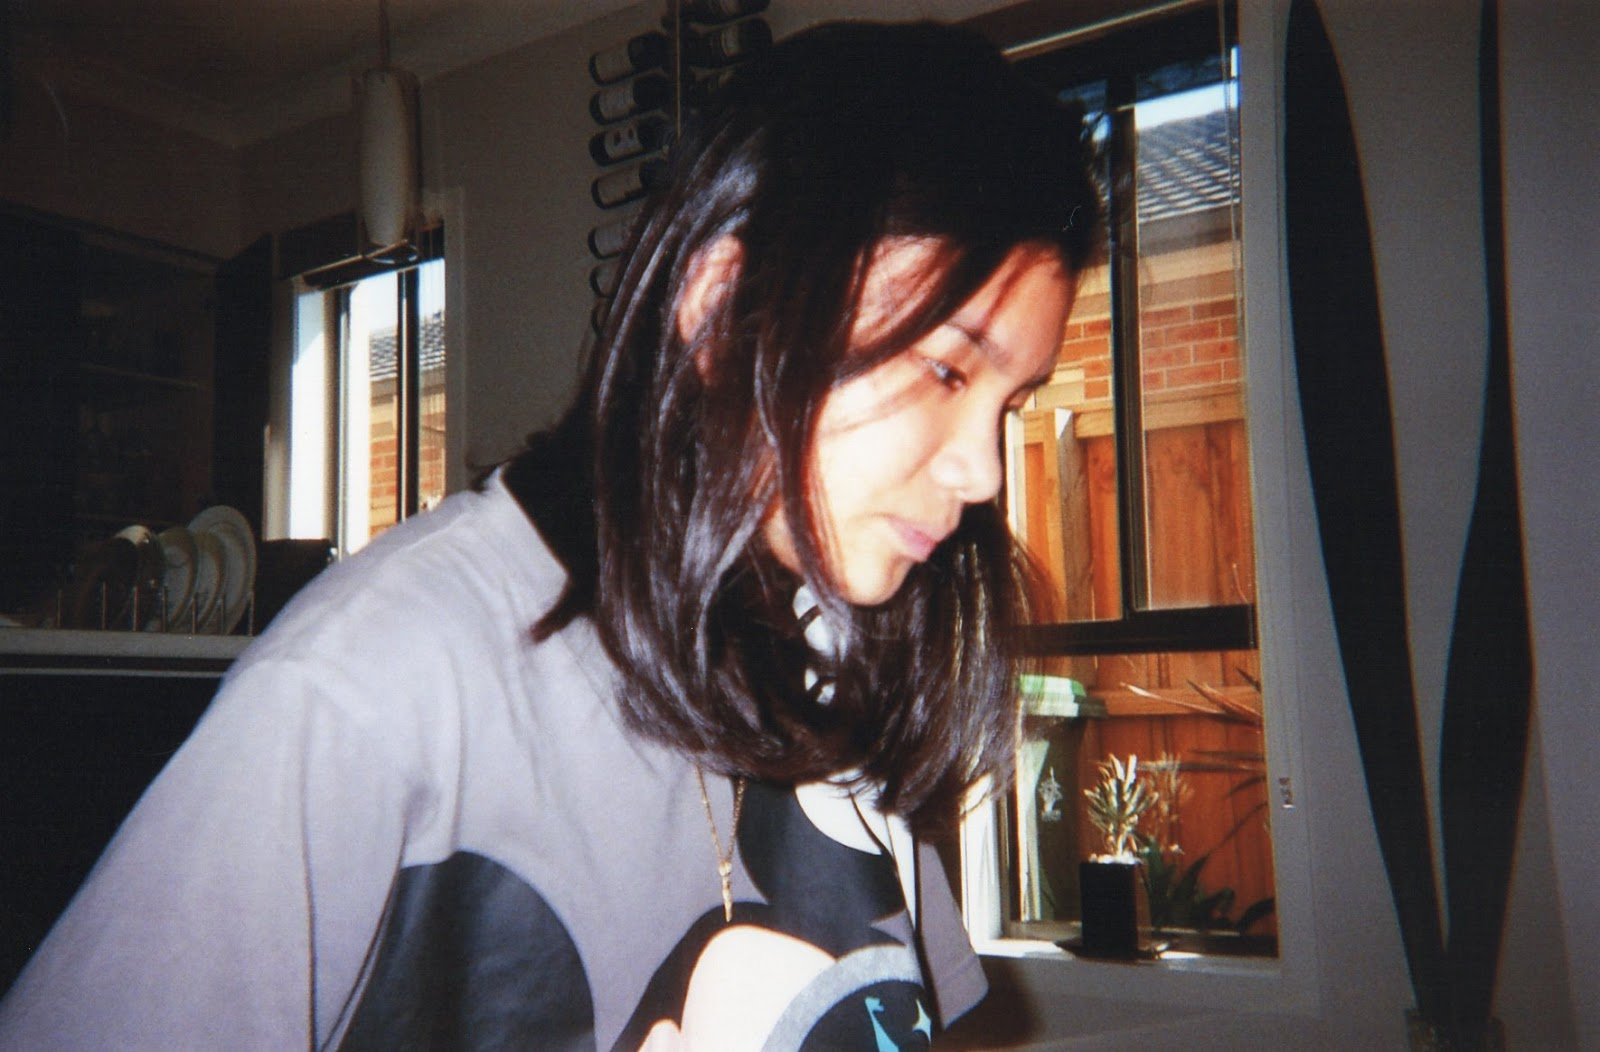 elashock, blog, blogger, australia, japan, japanese, girl, fashion, photography, film, camera, disposables, disposable camera, snapshots, polaroid, エラショック, ブログ, ブロガー, 写真, 使い捨て, カメラ, オーストラリア, 日本語, 女子, 女子高生, ポラロイド, フィルム, フィルムカメラ